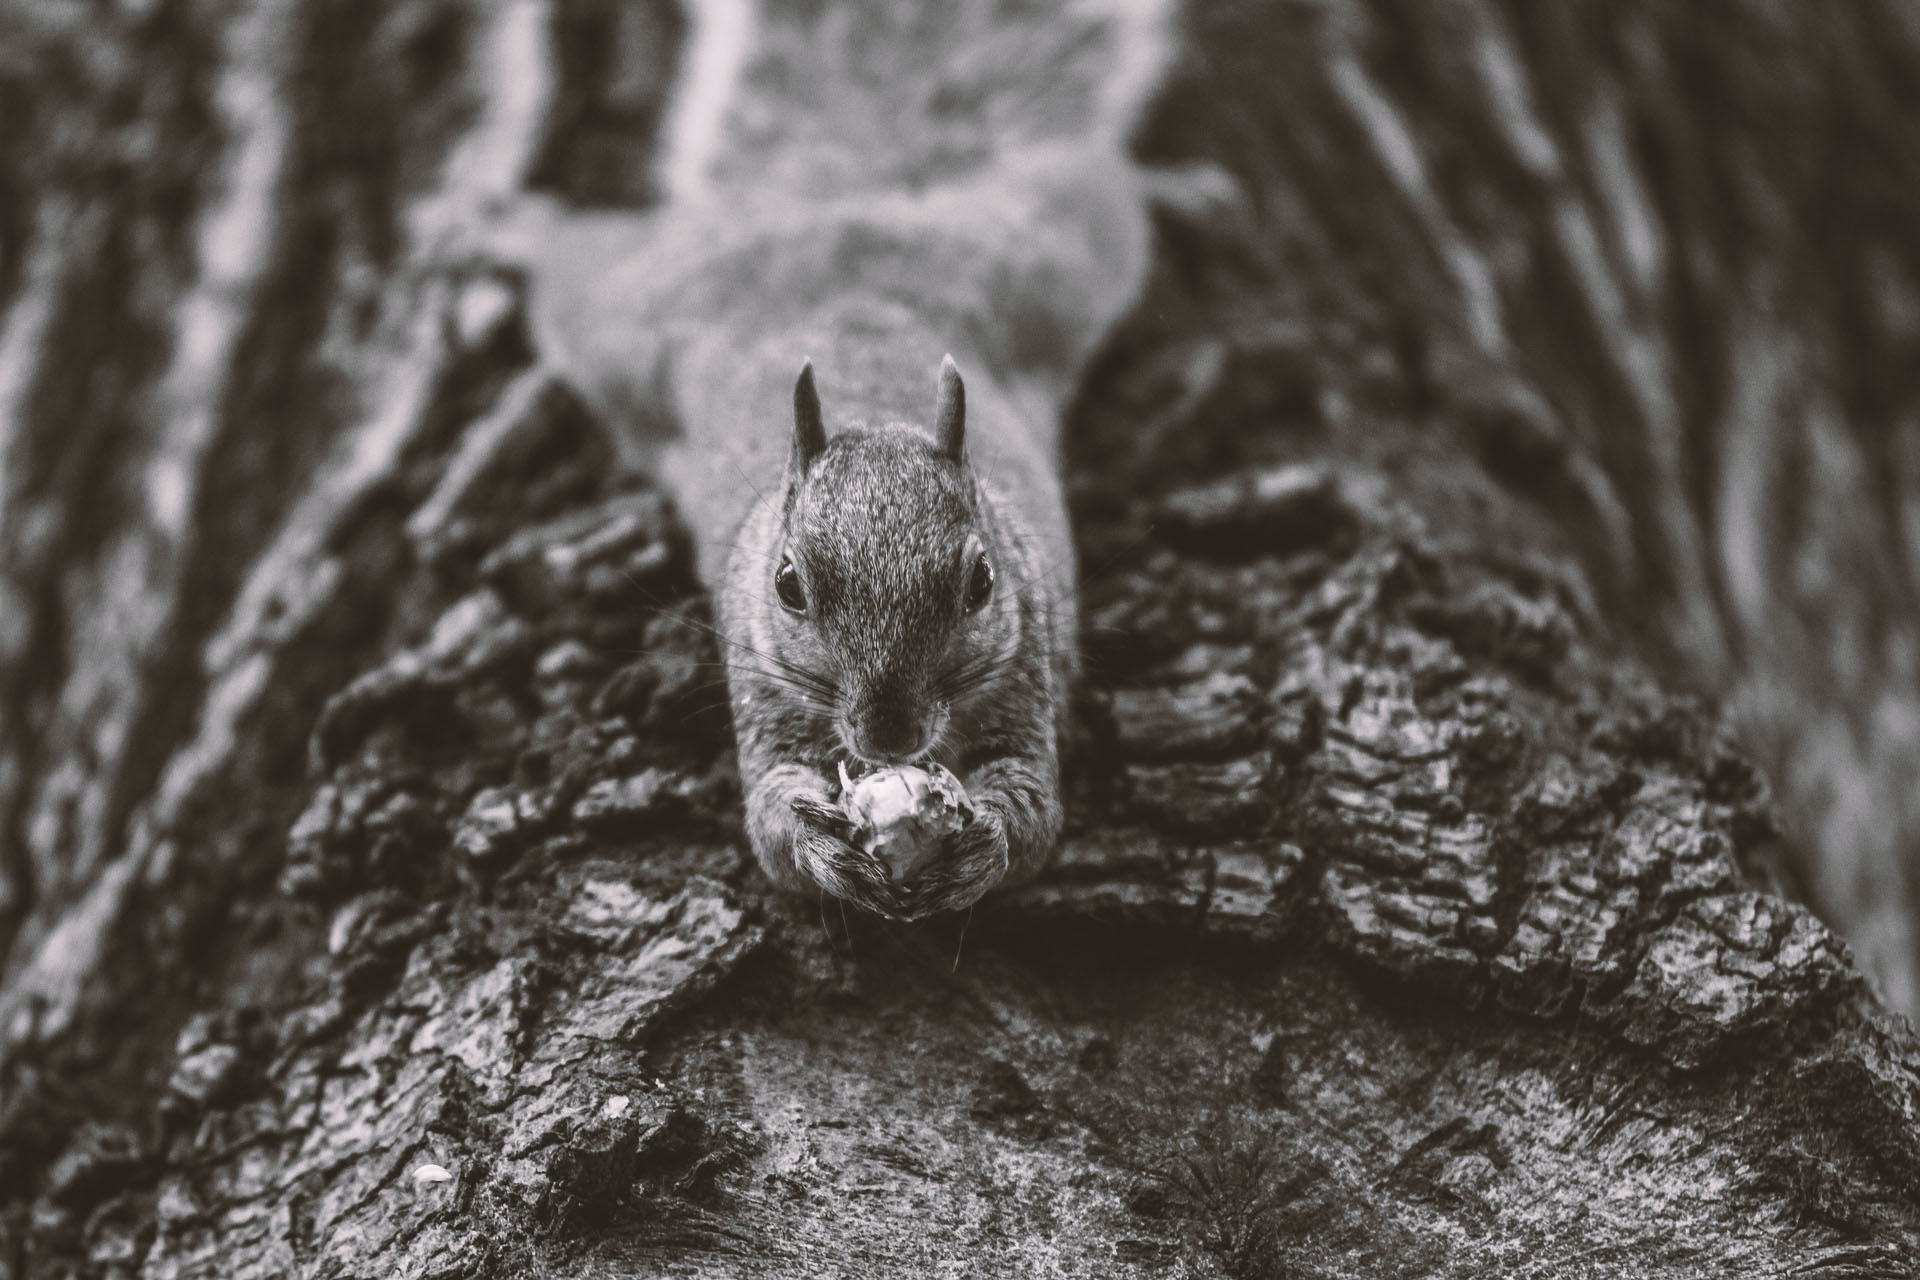 animal-1842152_1920.jpg